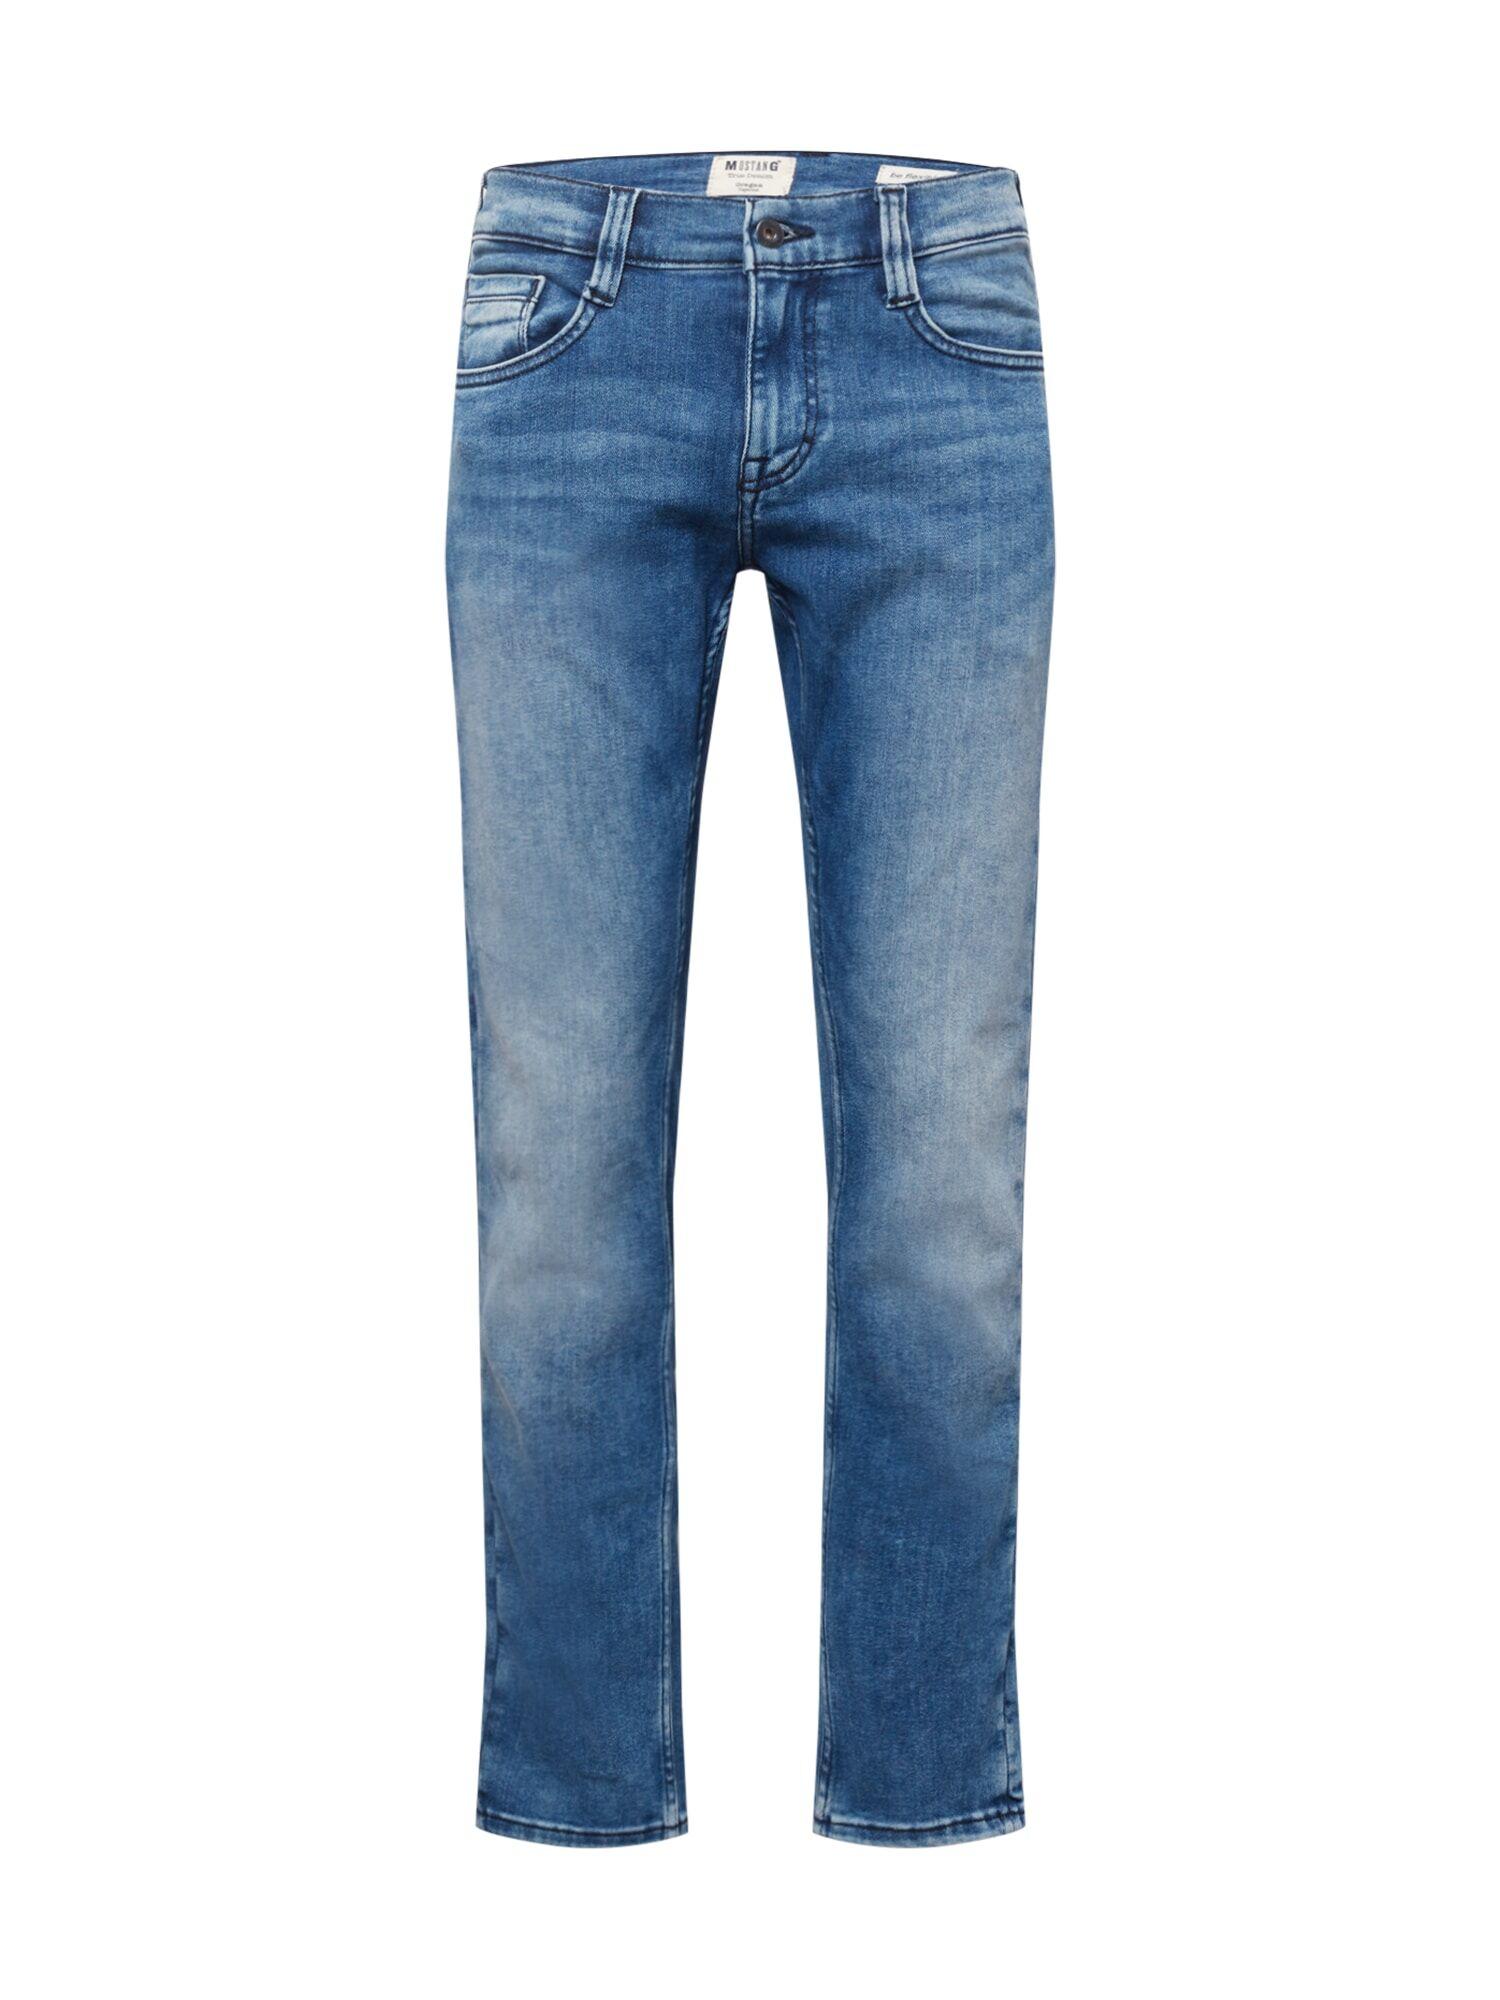 MUSTANG Jean 'Oregon'  - Bleu - Taille: 40 - male